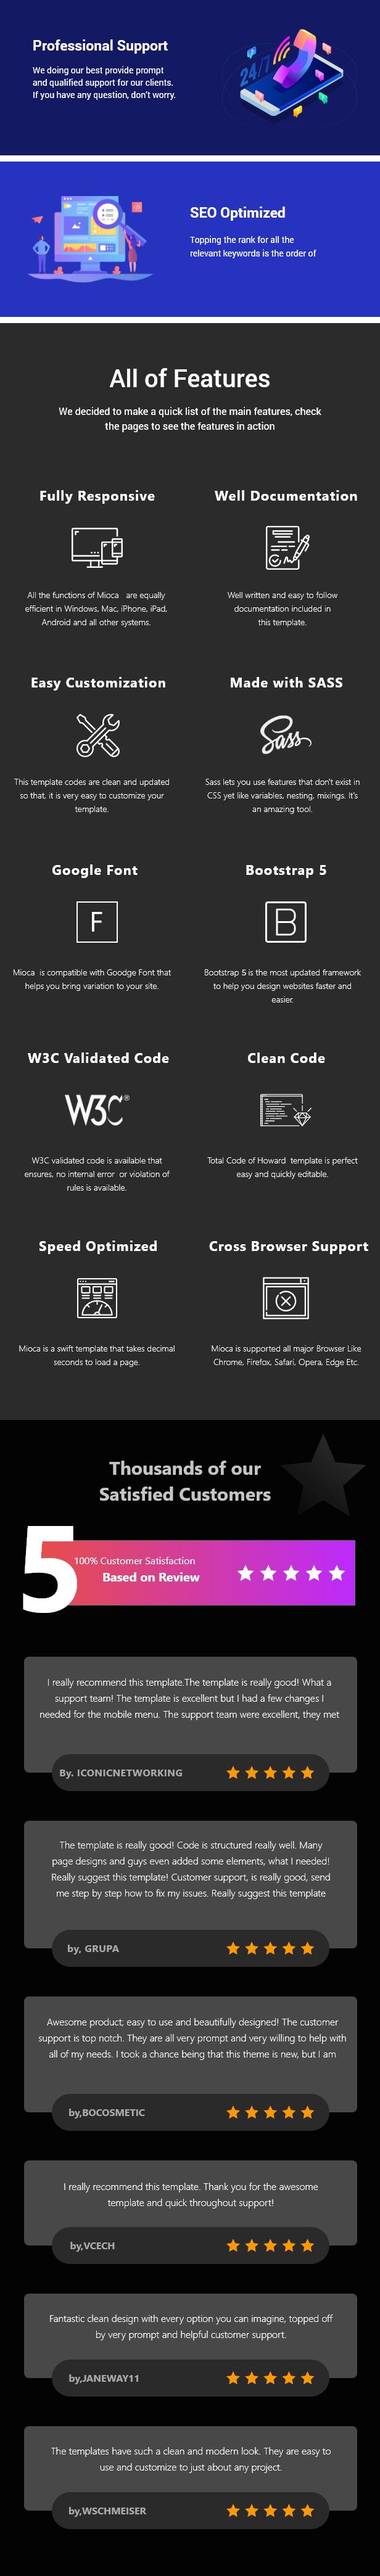 Mioca - Handmade Goods eCommerce HTML Template - 2